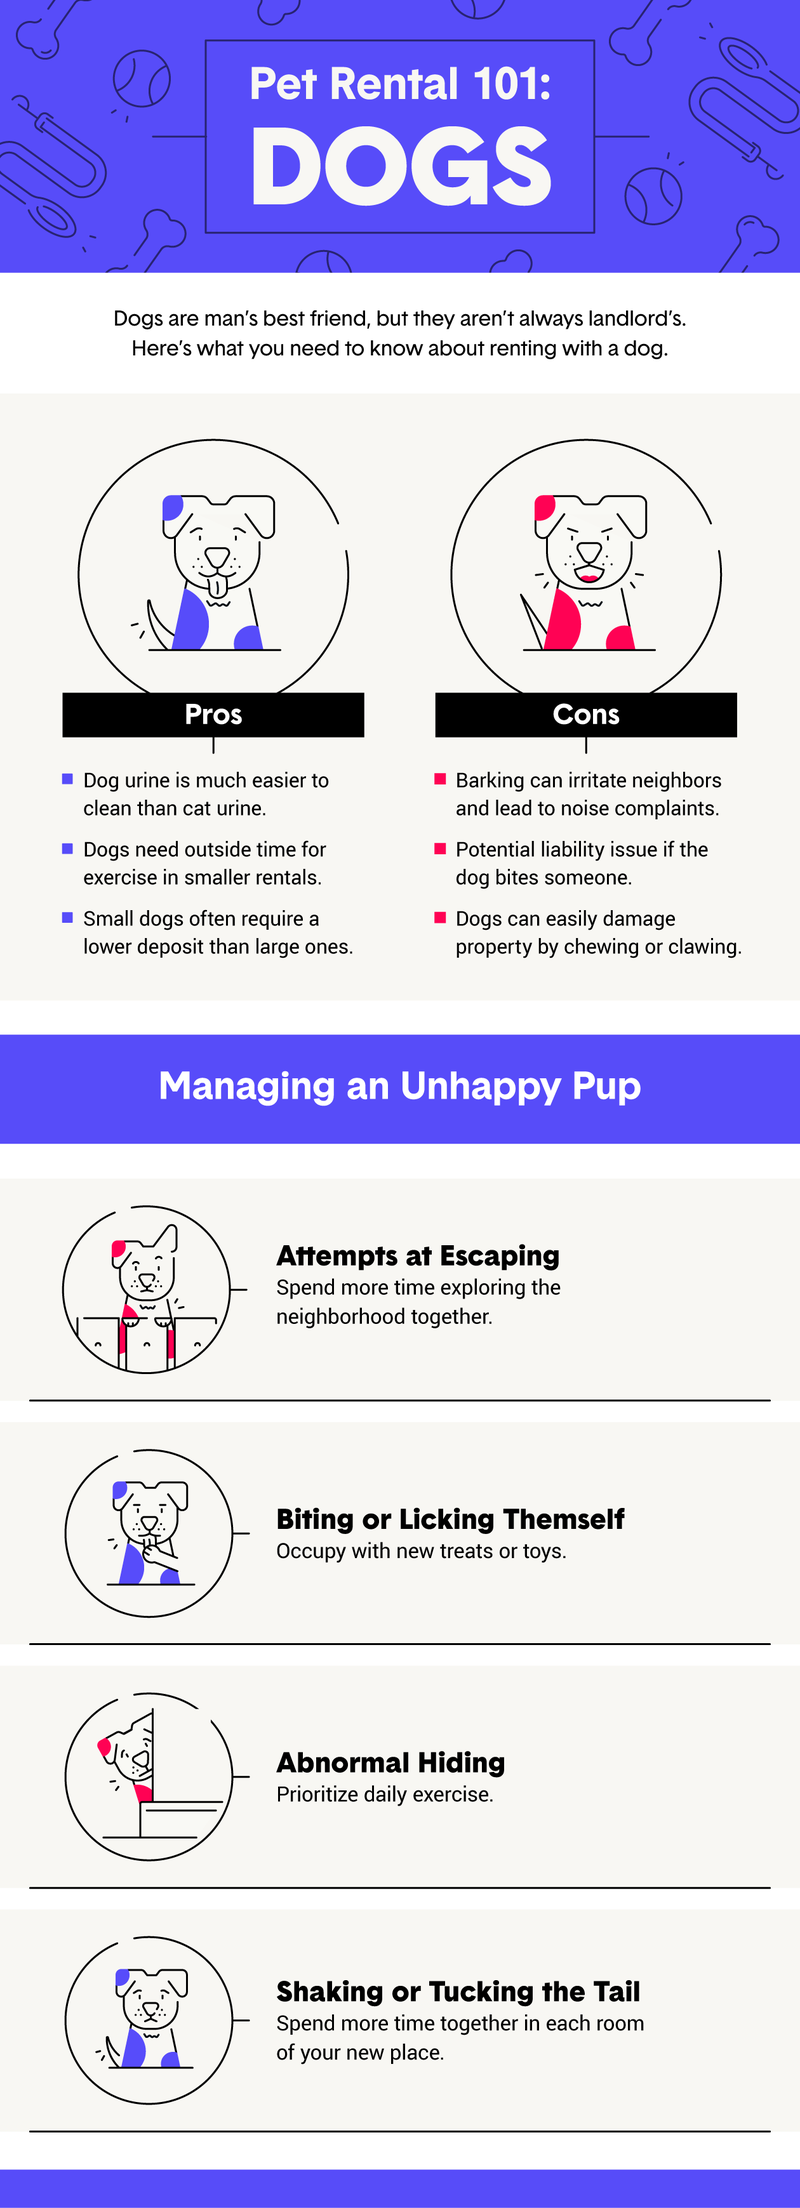 pet-rental-101-dogs.png